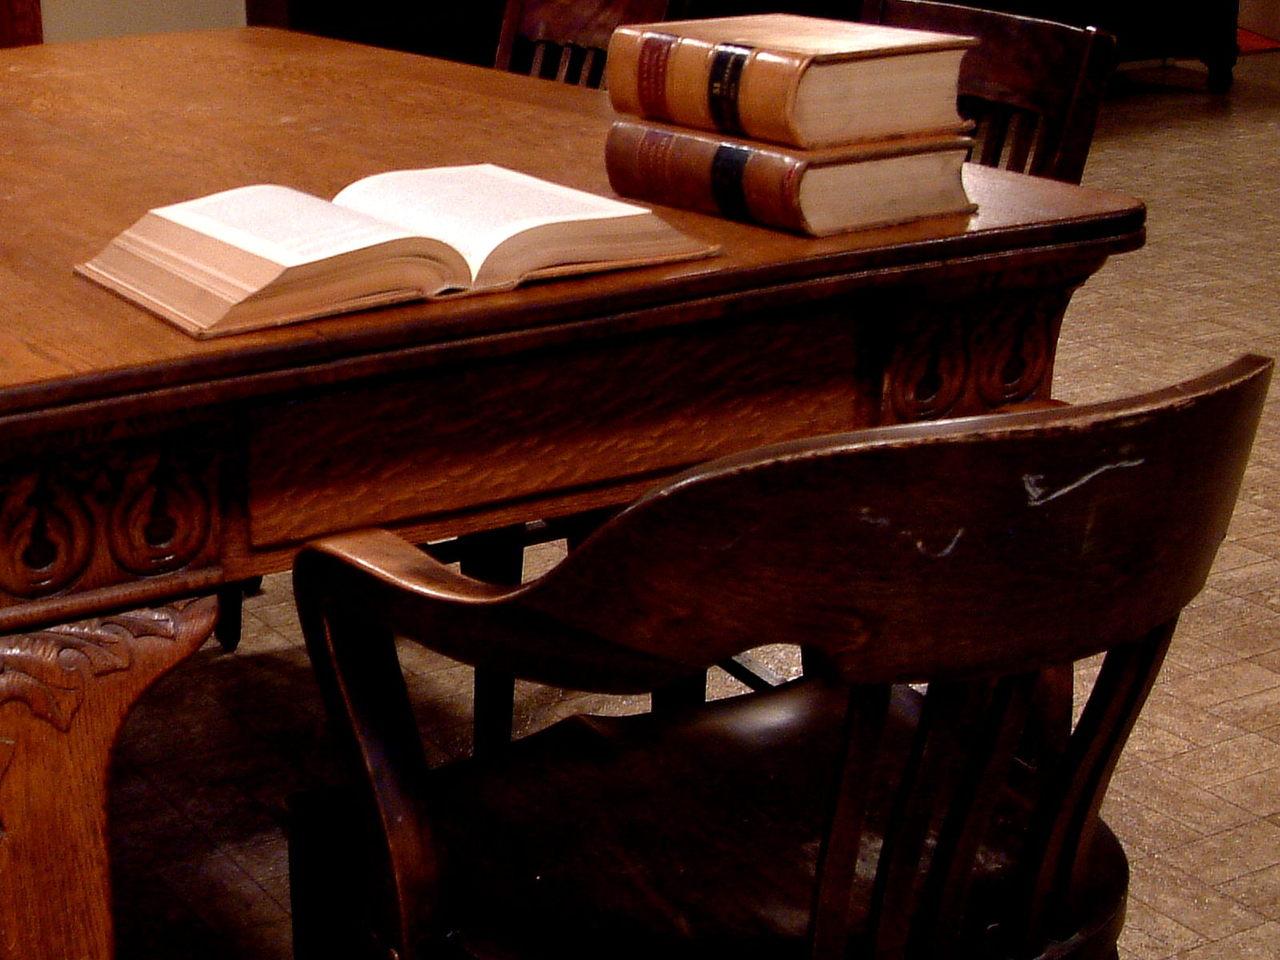 law-education-series-2-1467427-1280x960.jpg